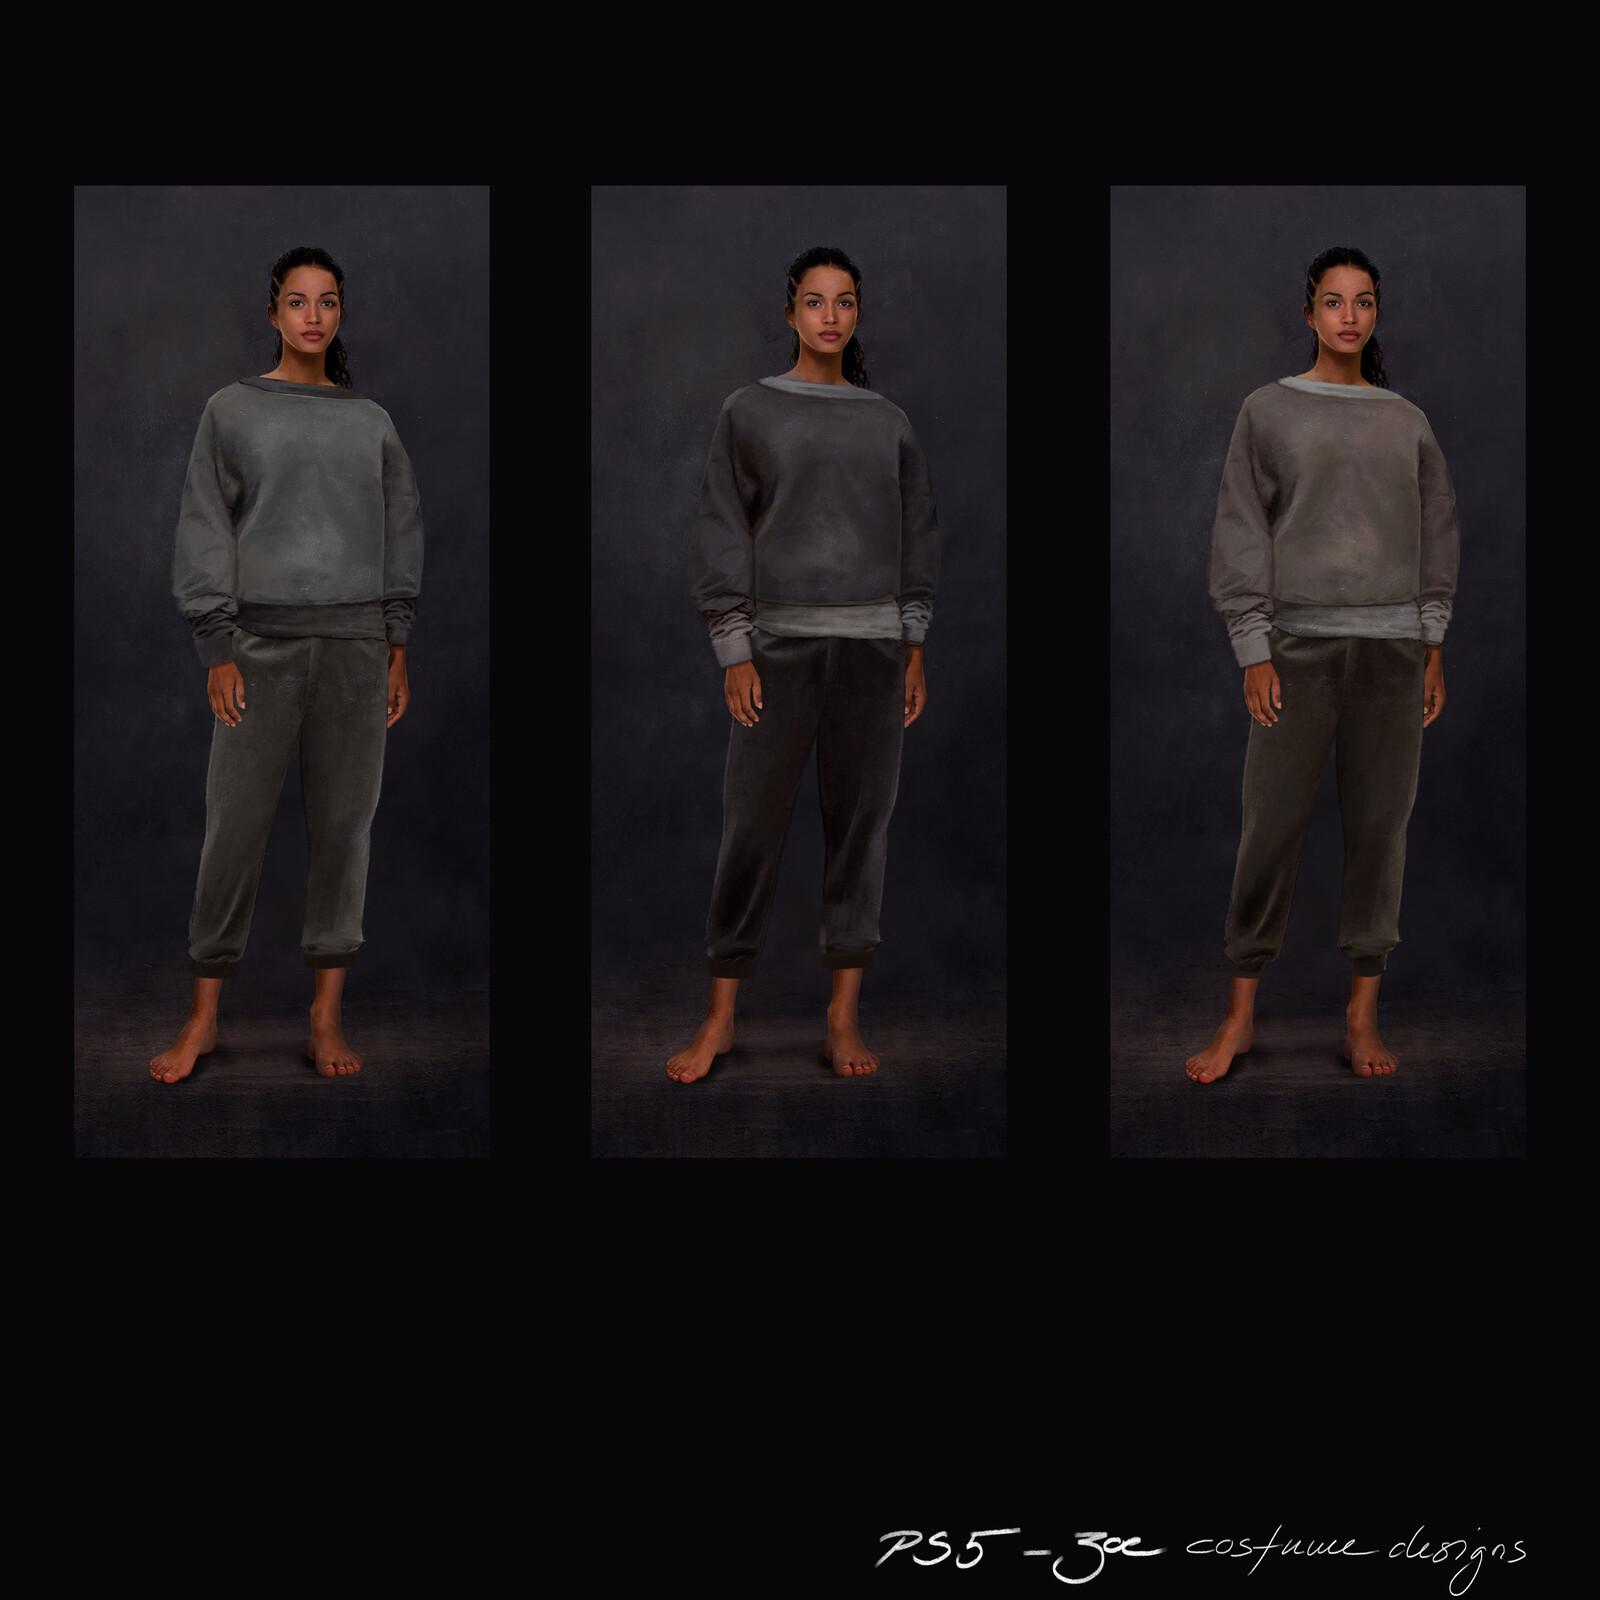 Concepts 02